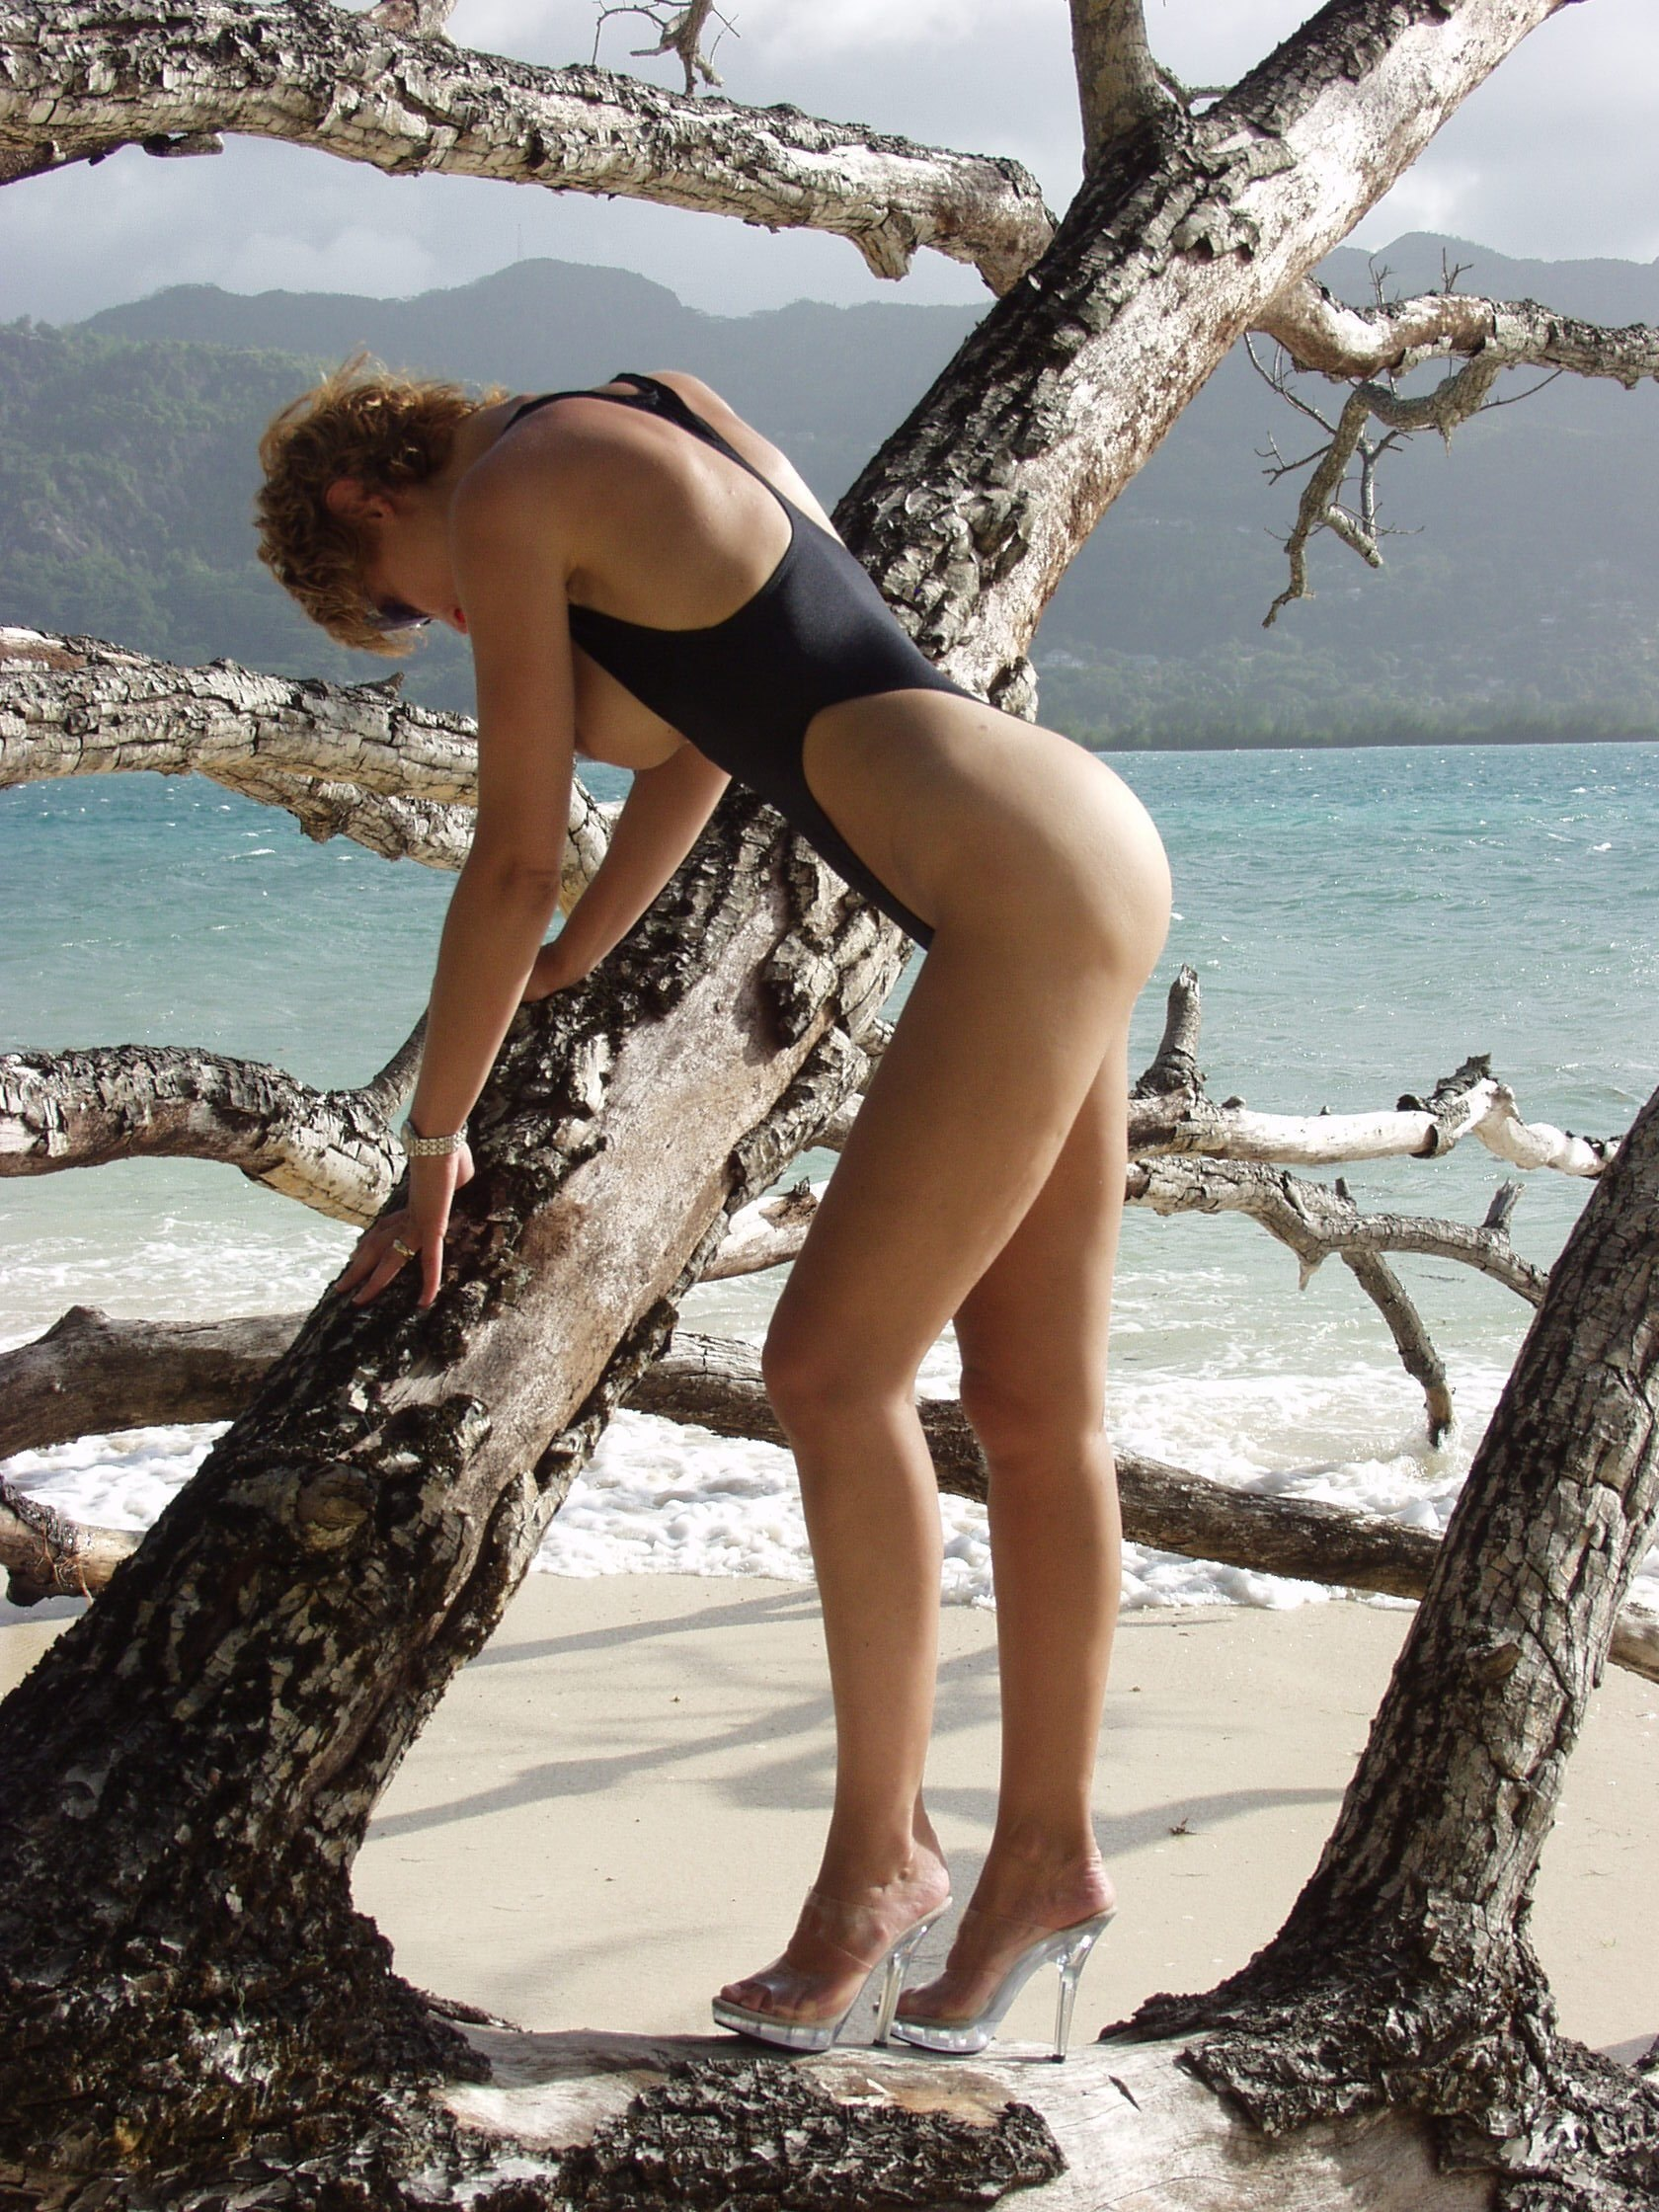 Milf one piece bathing suit